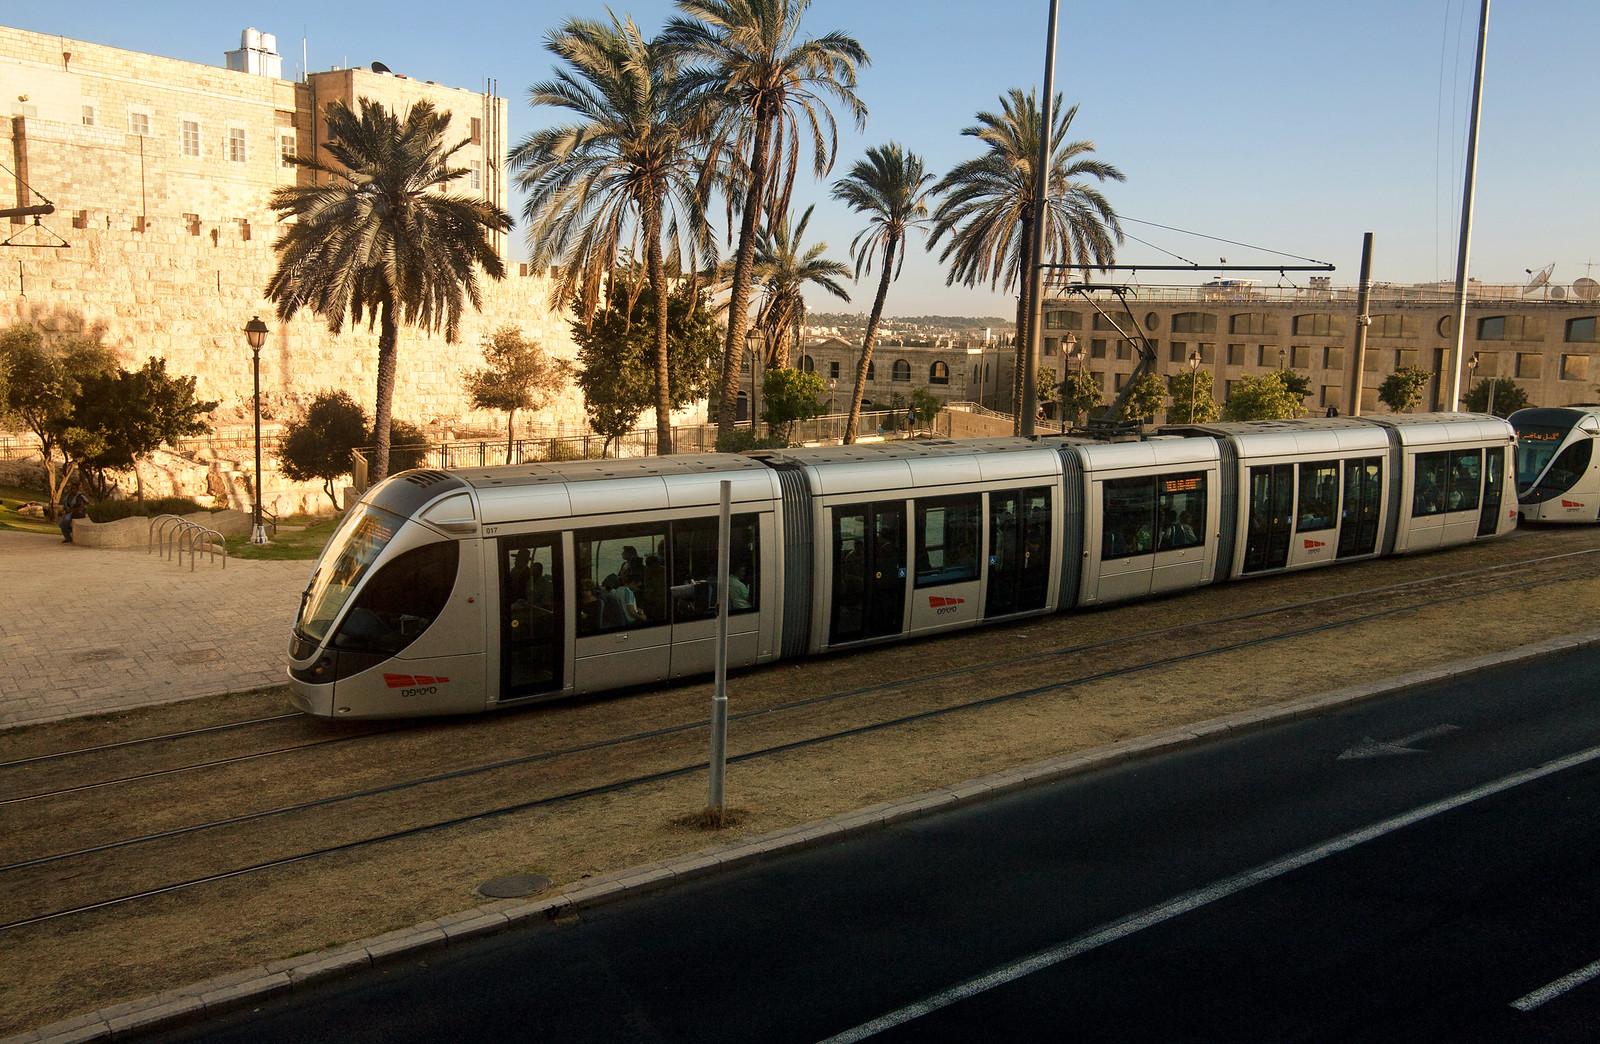 Jerusalem_light train_1_Noam Chen_IMOT